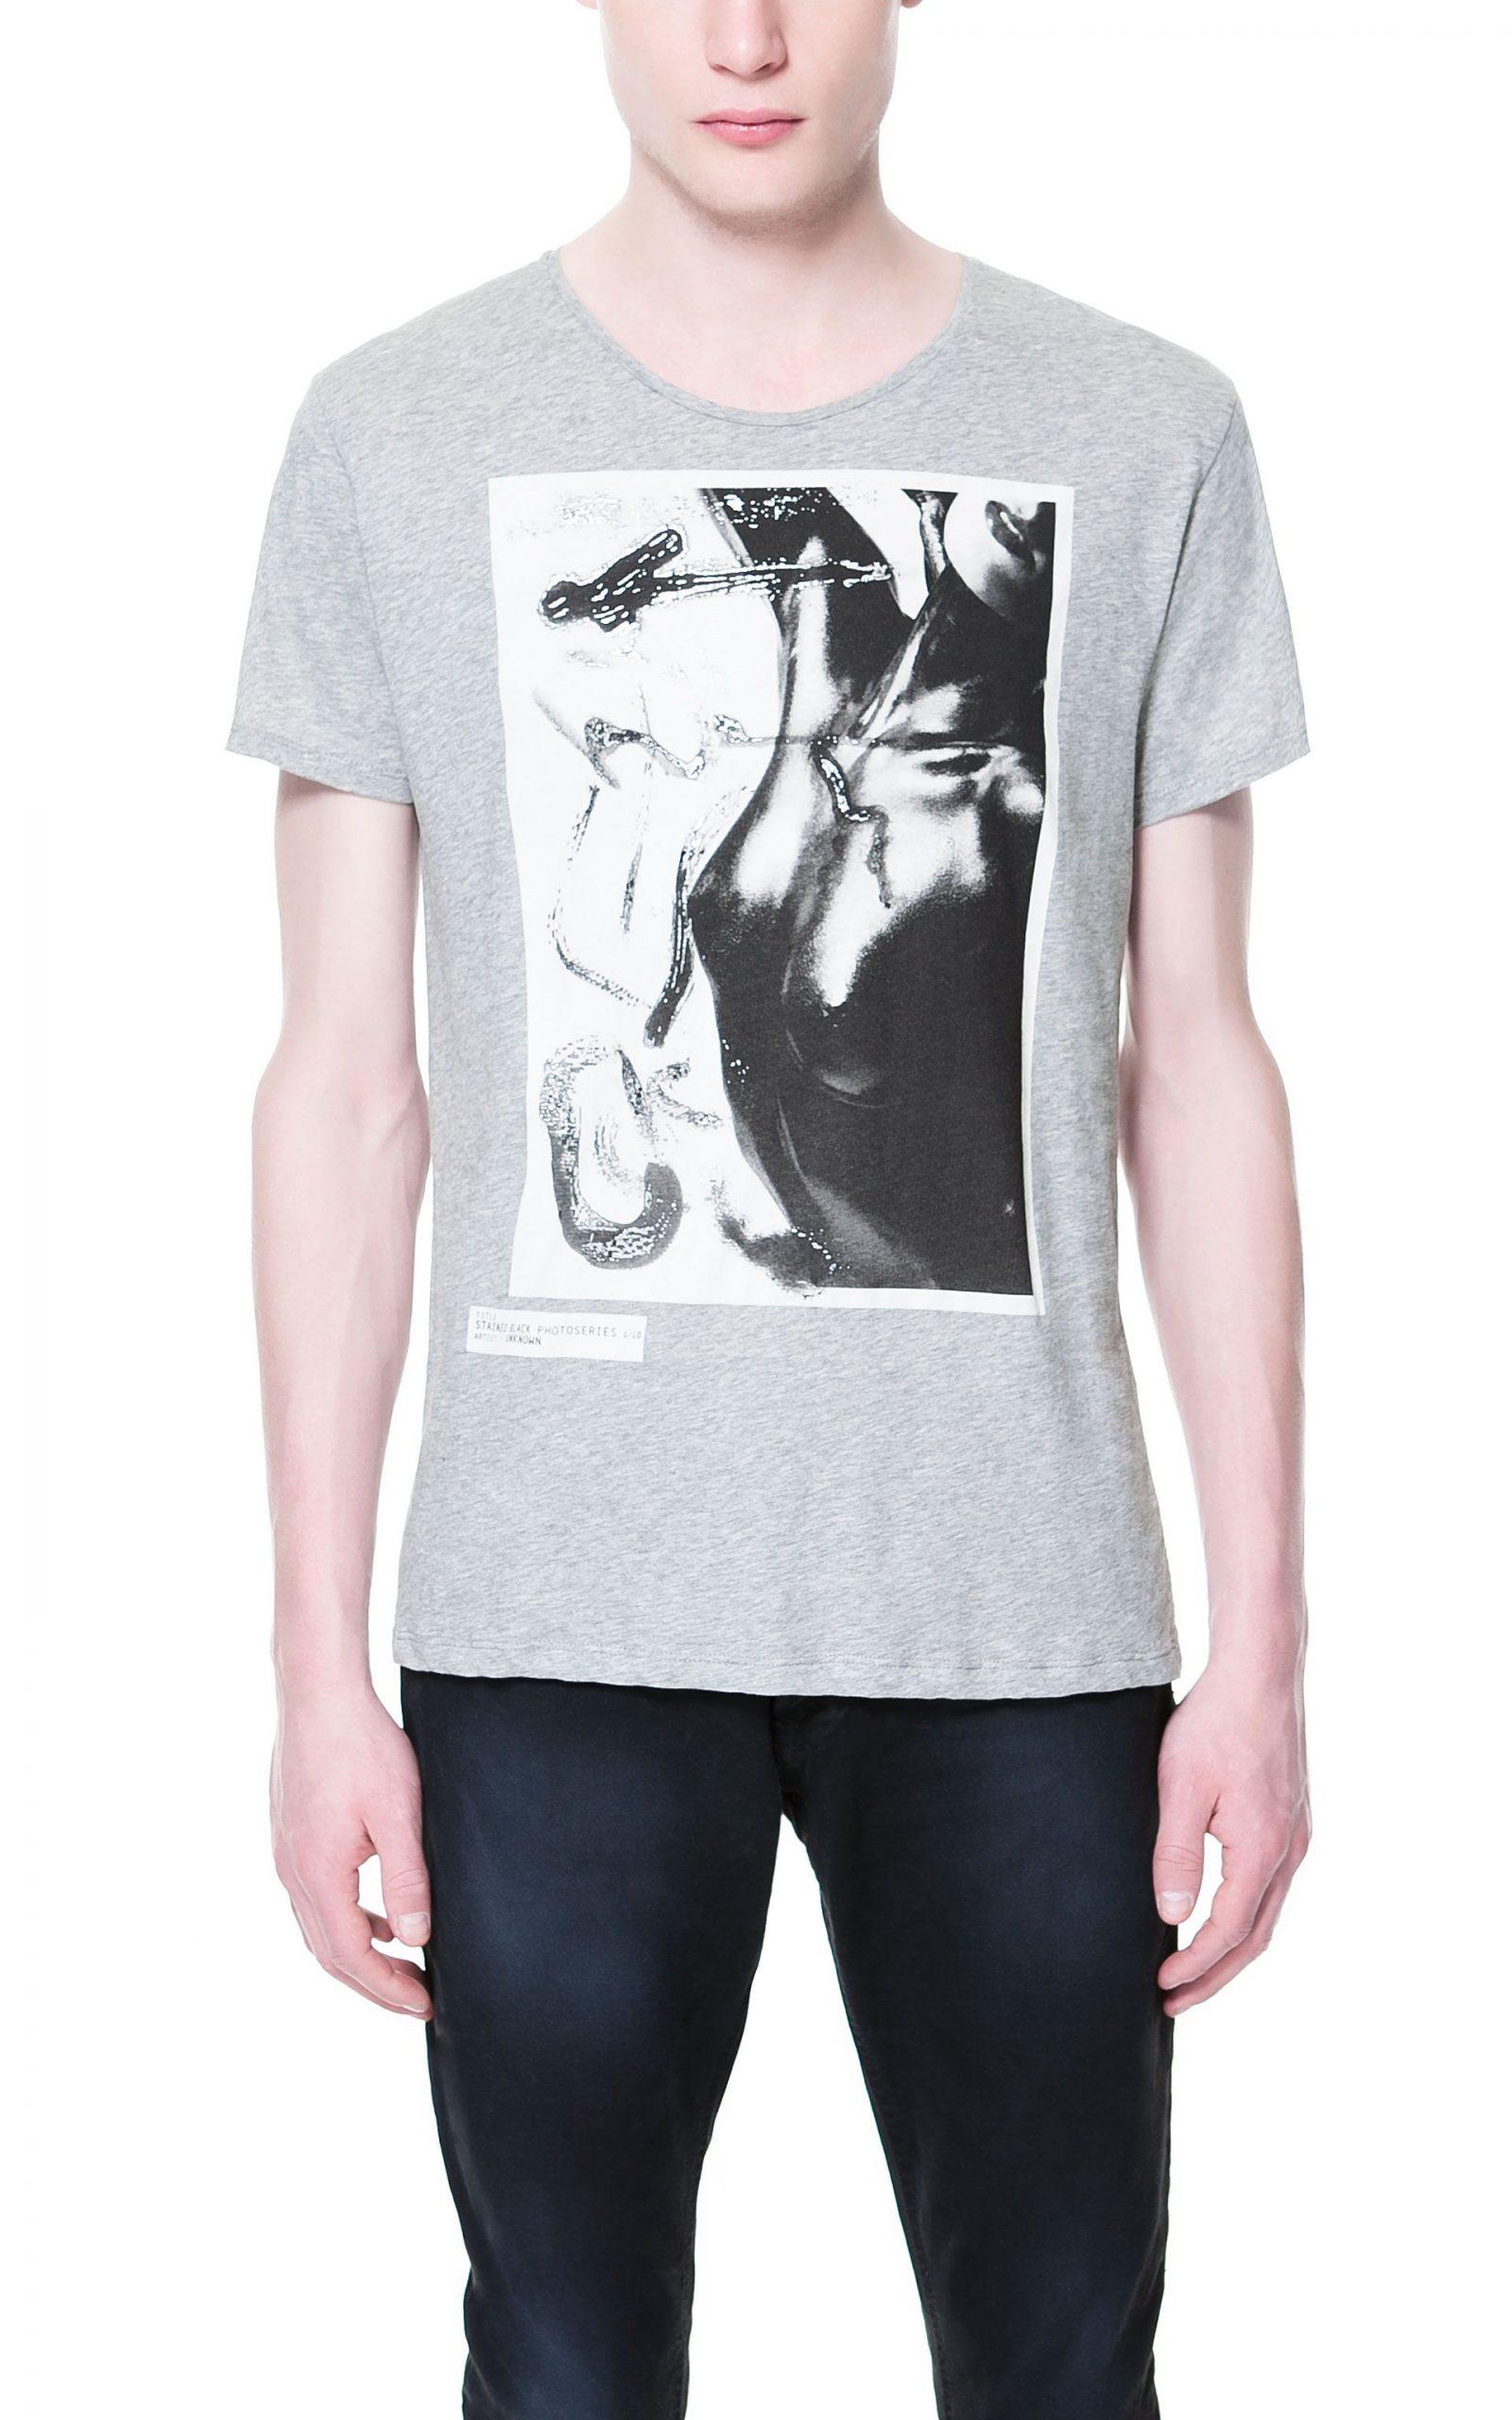 Girls Tshirt  Zara 2013  Camiseta Hombre Zara